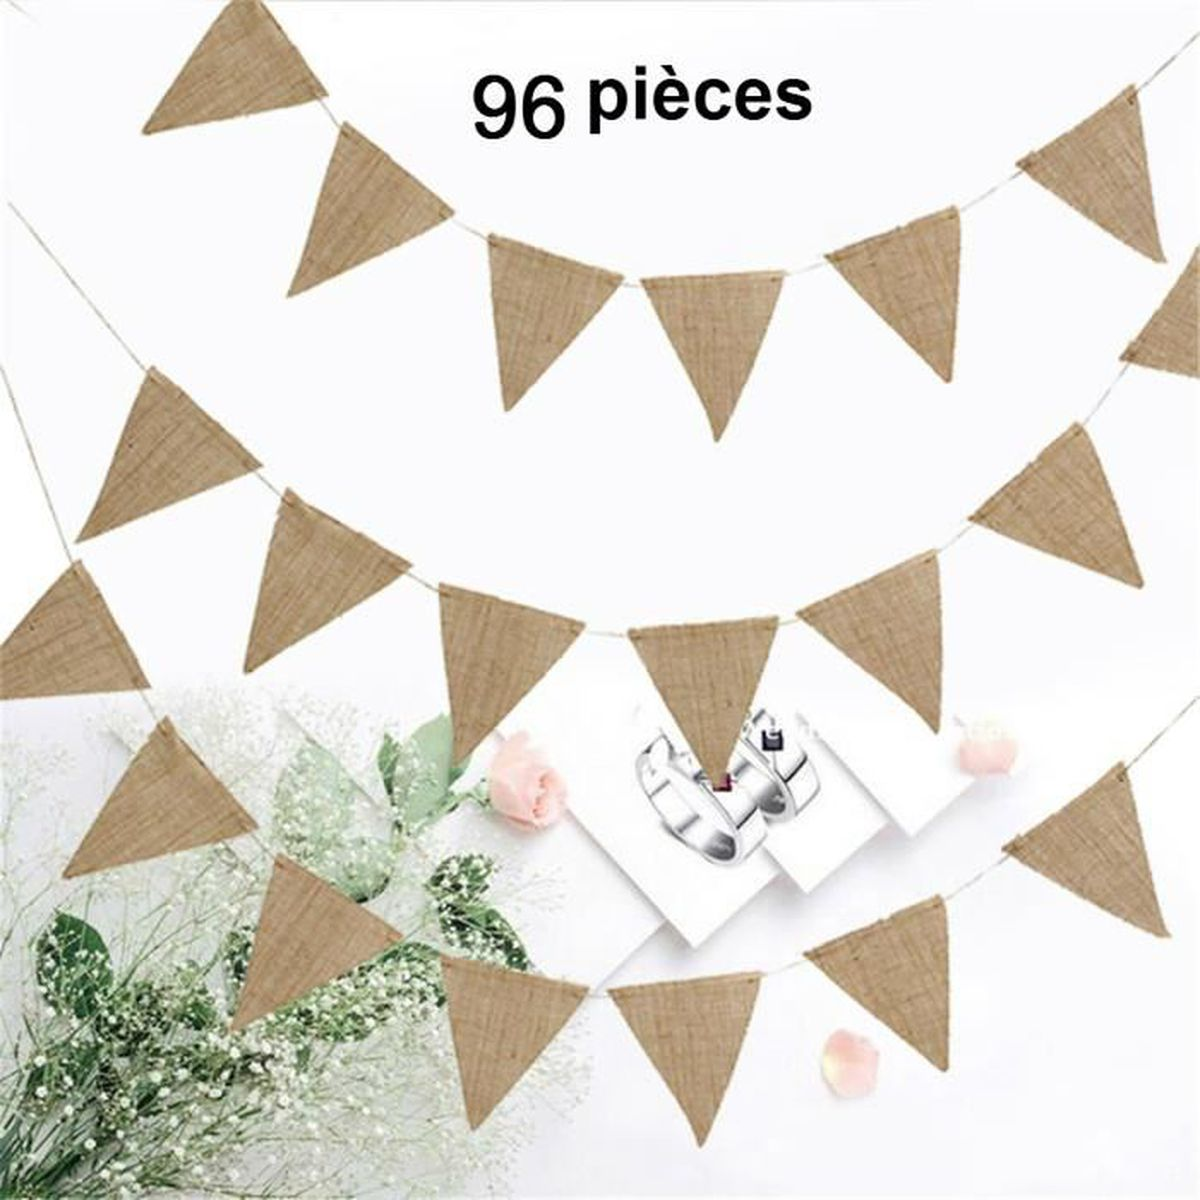 6 x 14 g Packs or rose Mr /& Mrs Table Confettis Mariage Partie Décoration